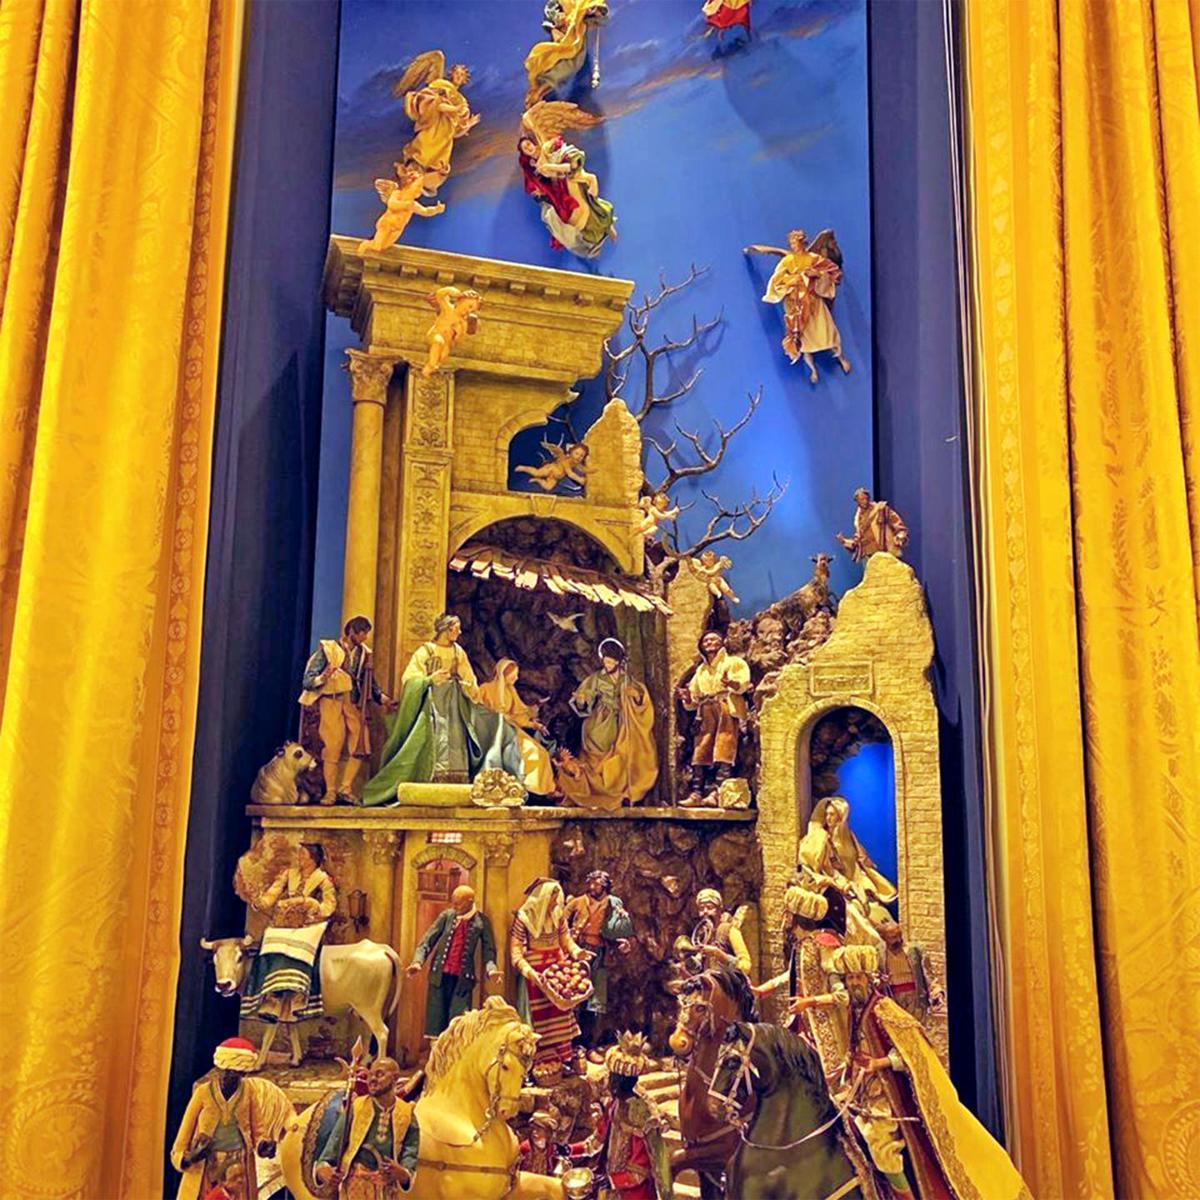 White House nativity